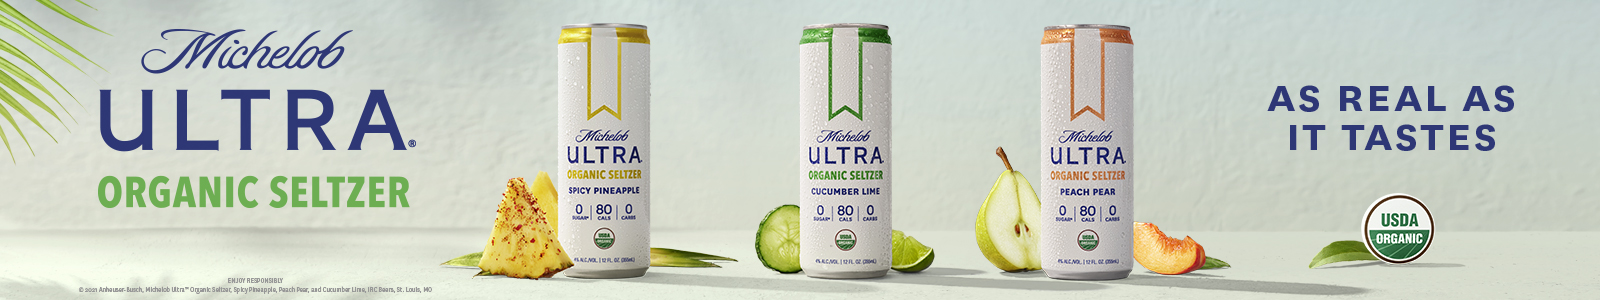 Ultra Selzer - Mich Ultra